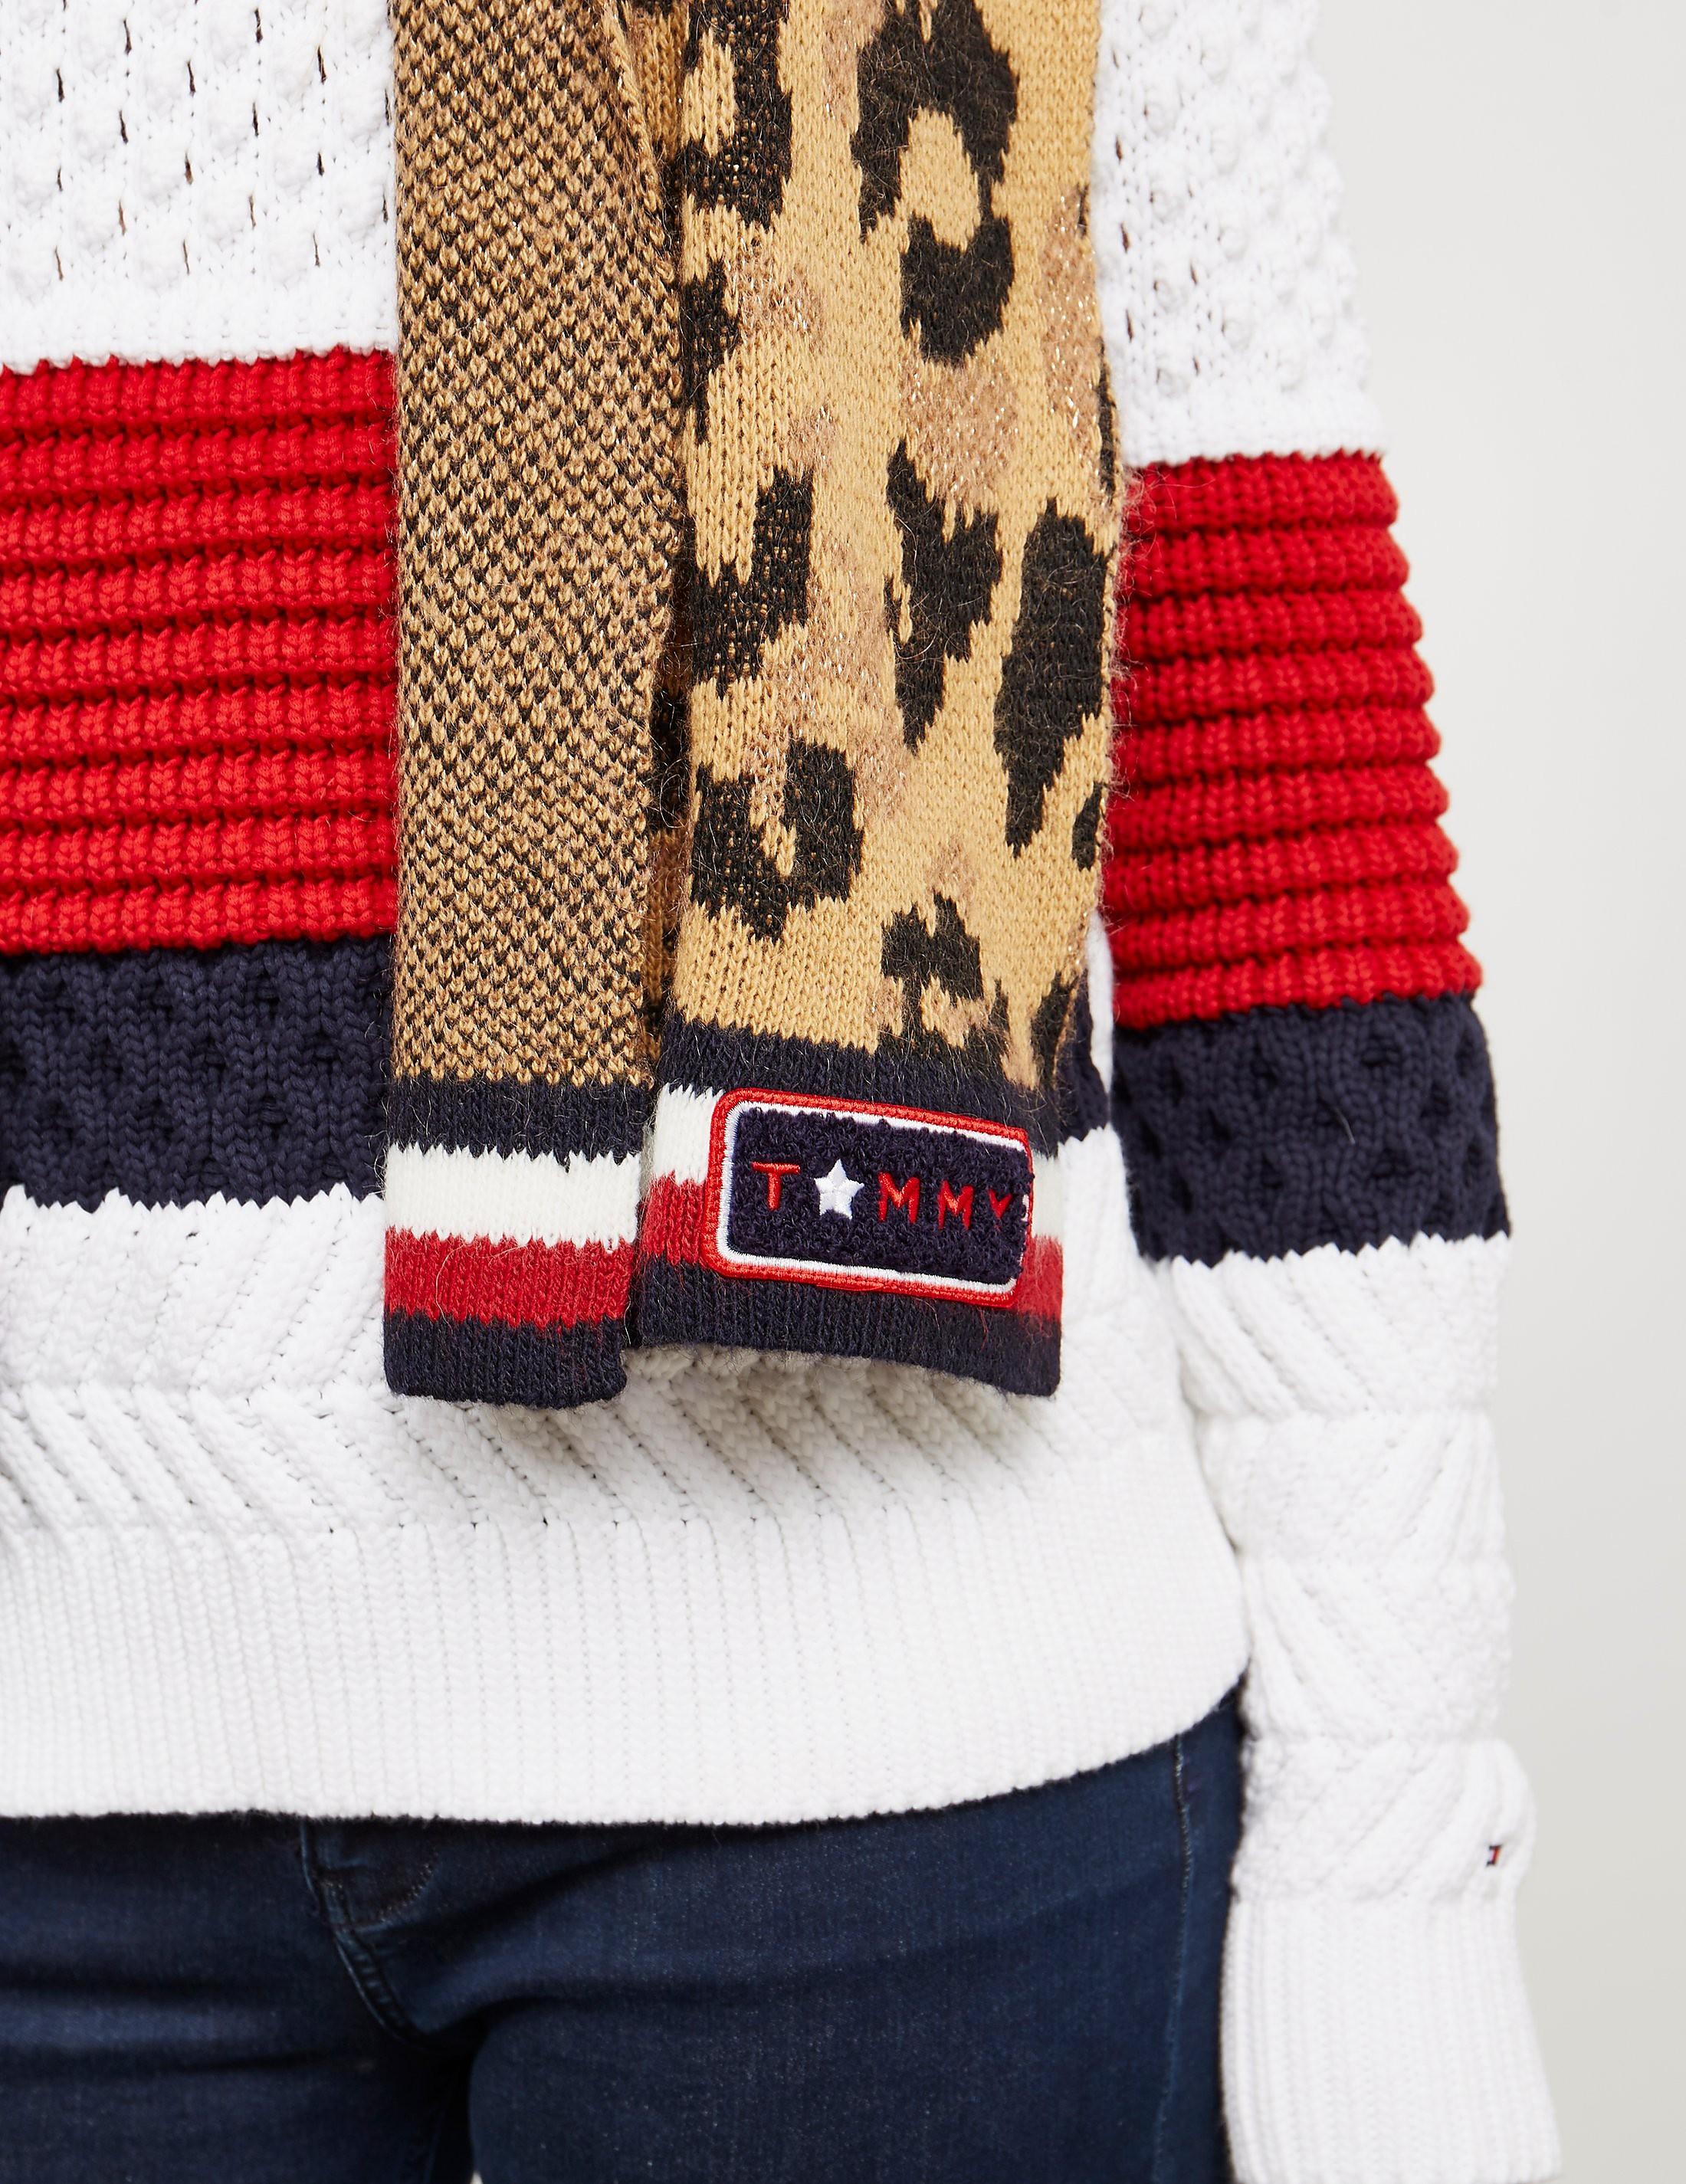 Tommy Hilfiger Leopard Knit Scarf